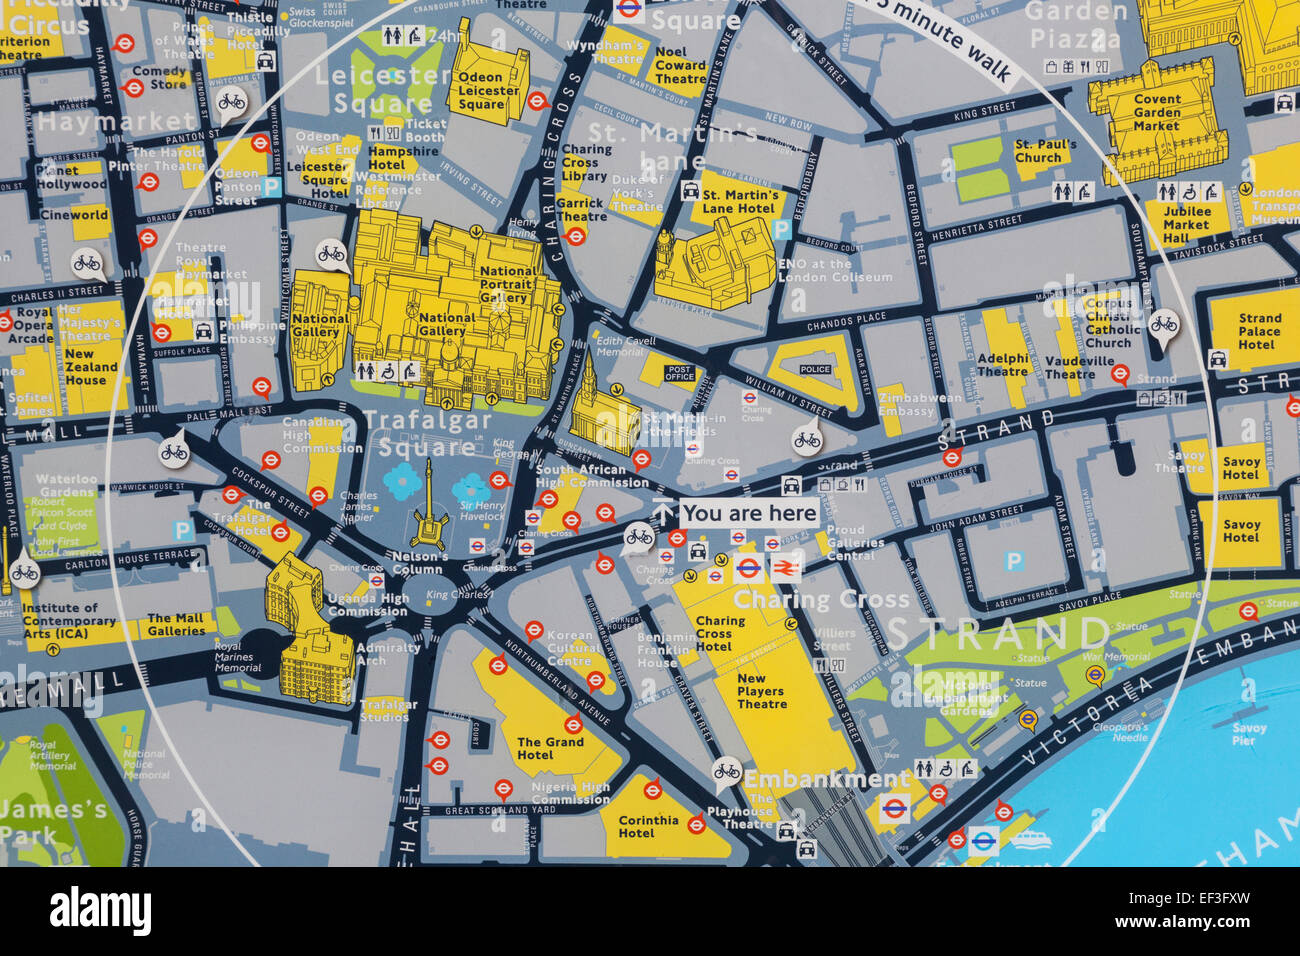 england london street map of trafalgar square and surrounding area stock image